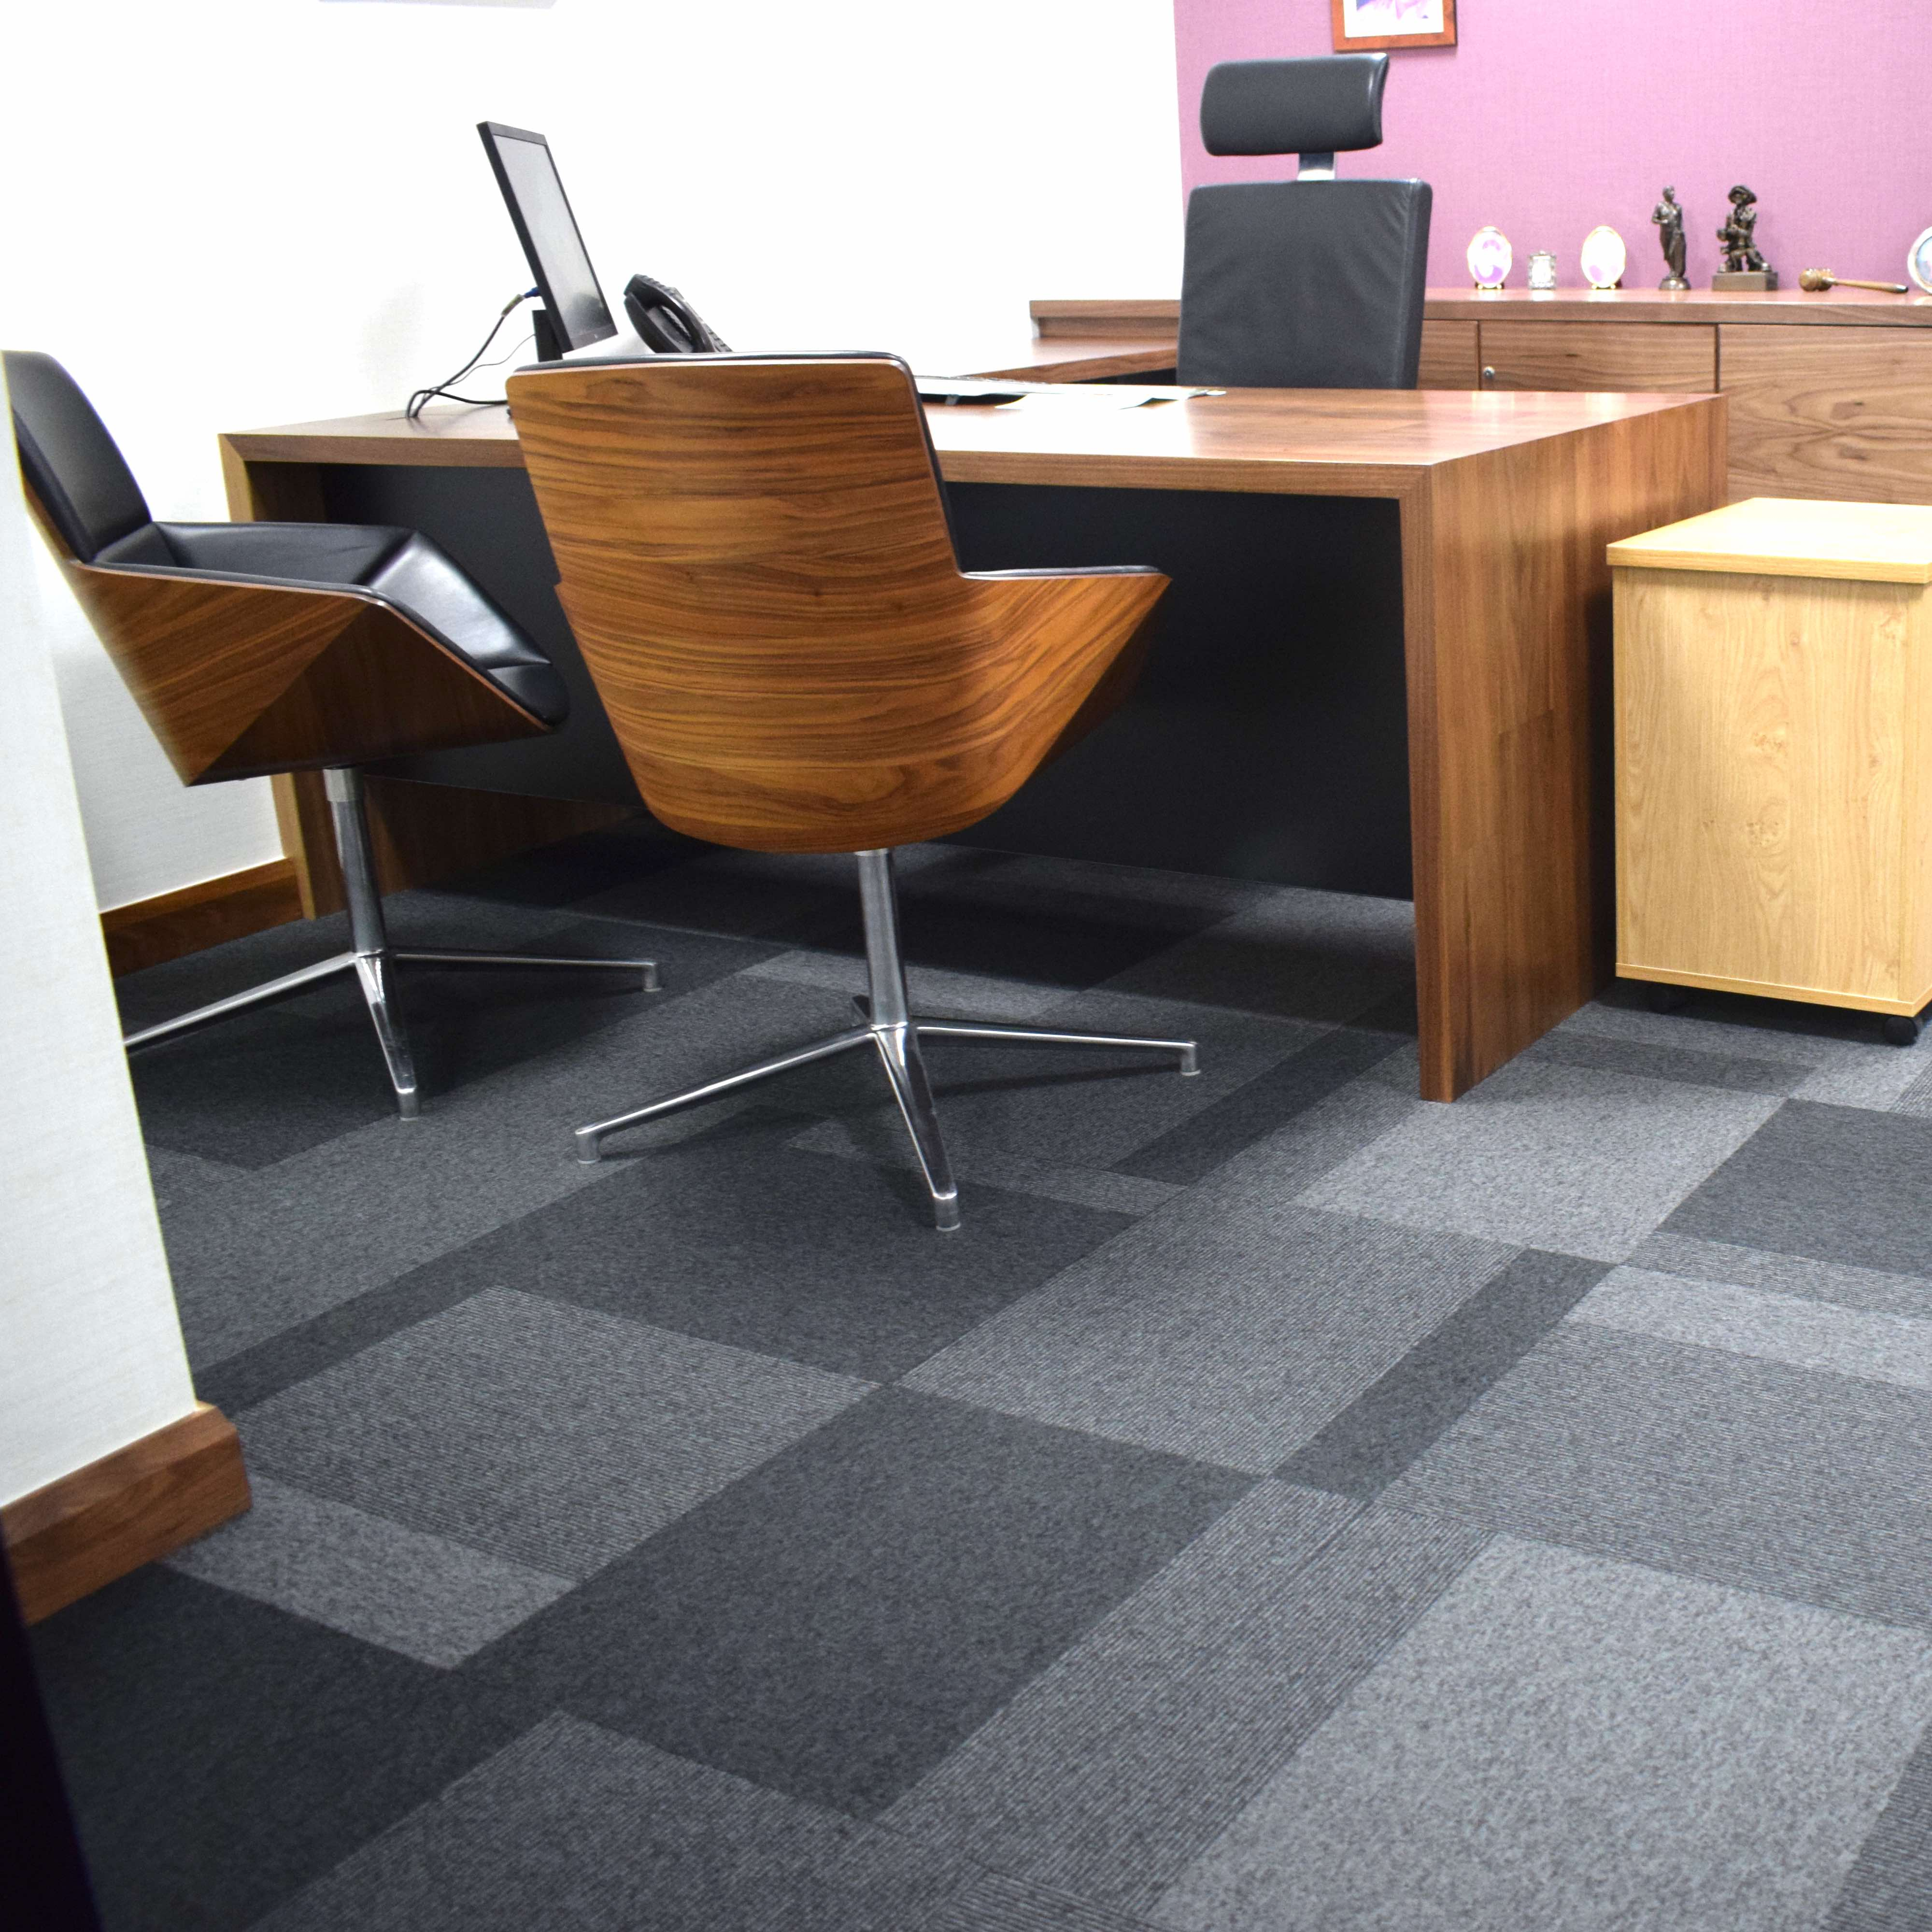 Paragon Carpet Tiles | Total Contrast | Office Visions Hero